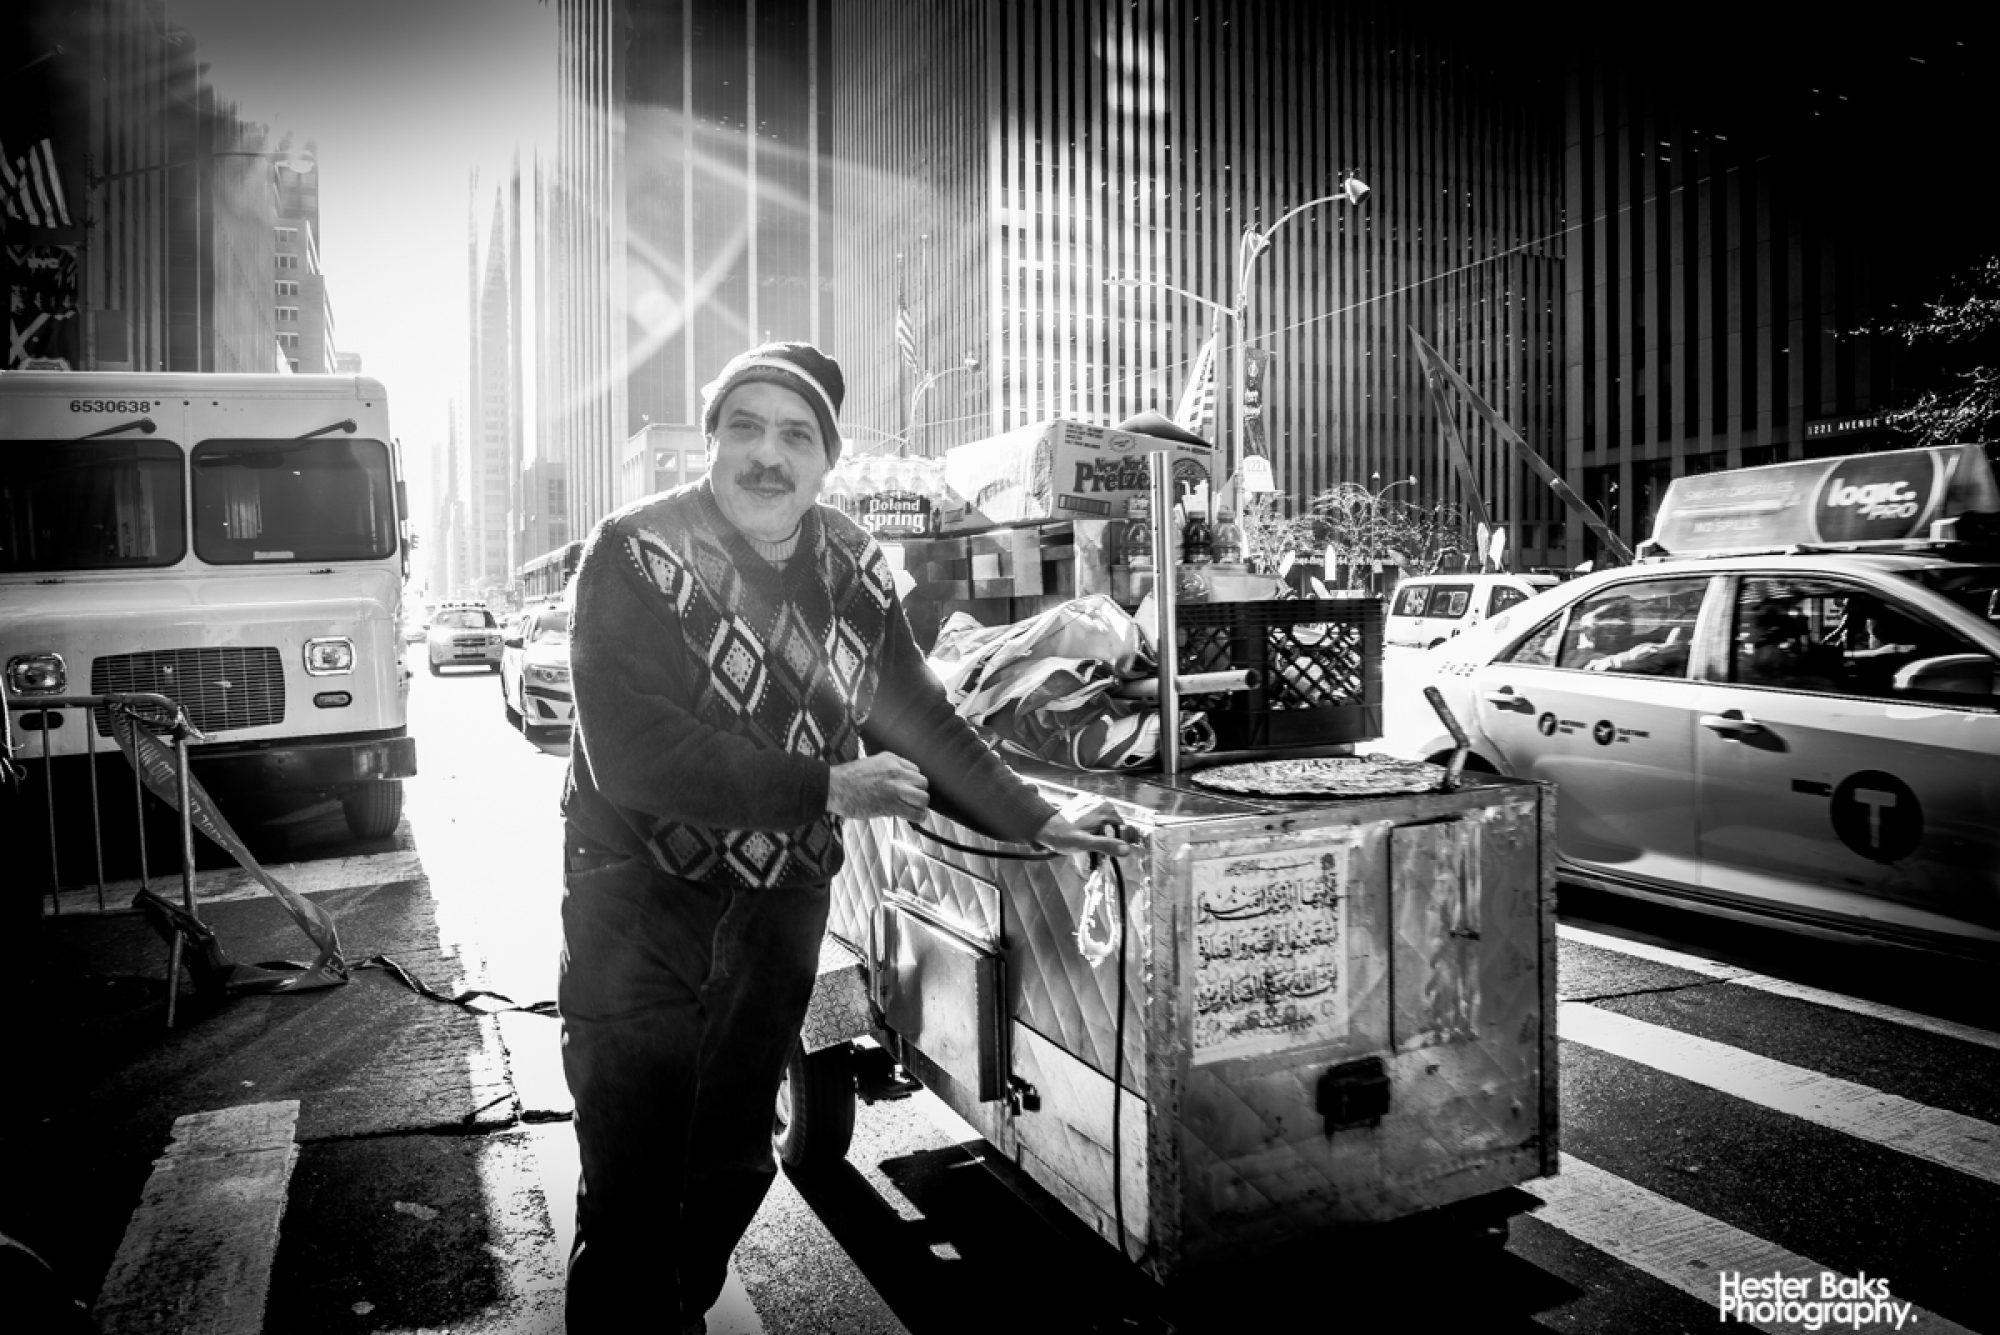 Hot dog man by Hester Baks Photography